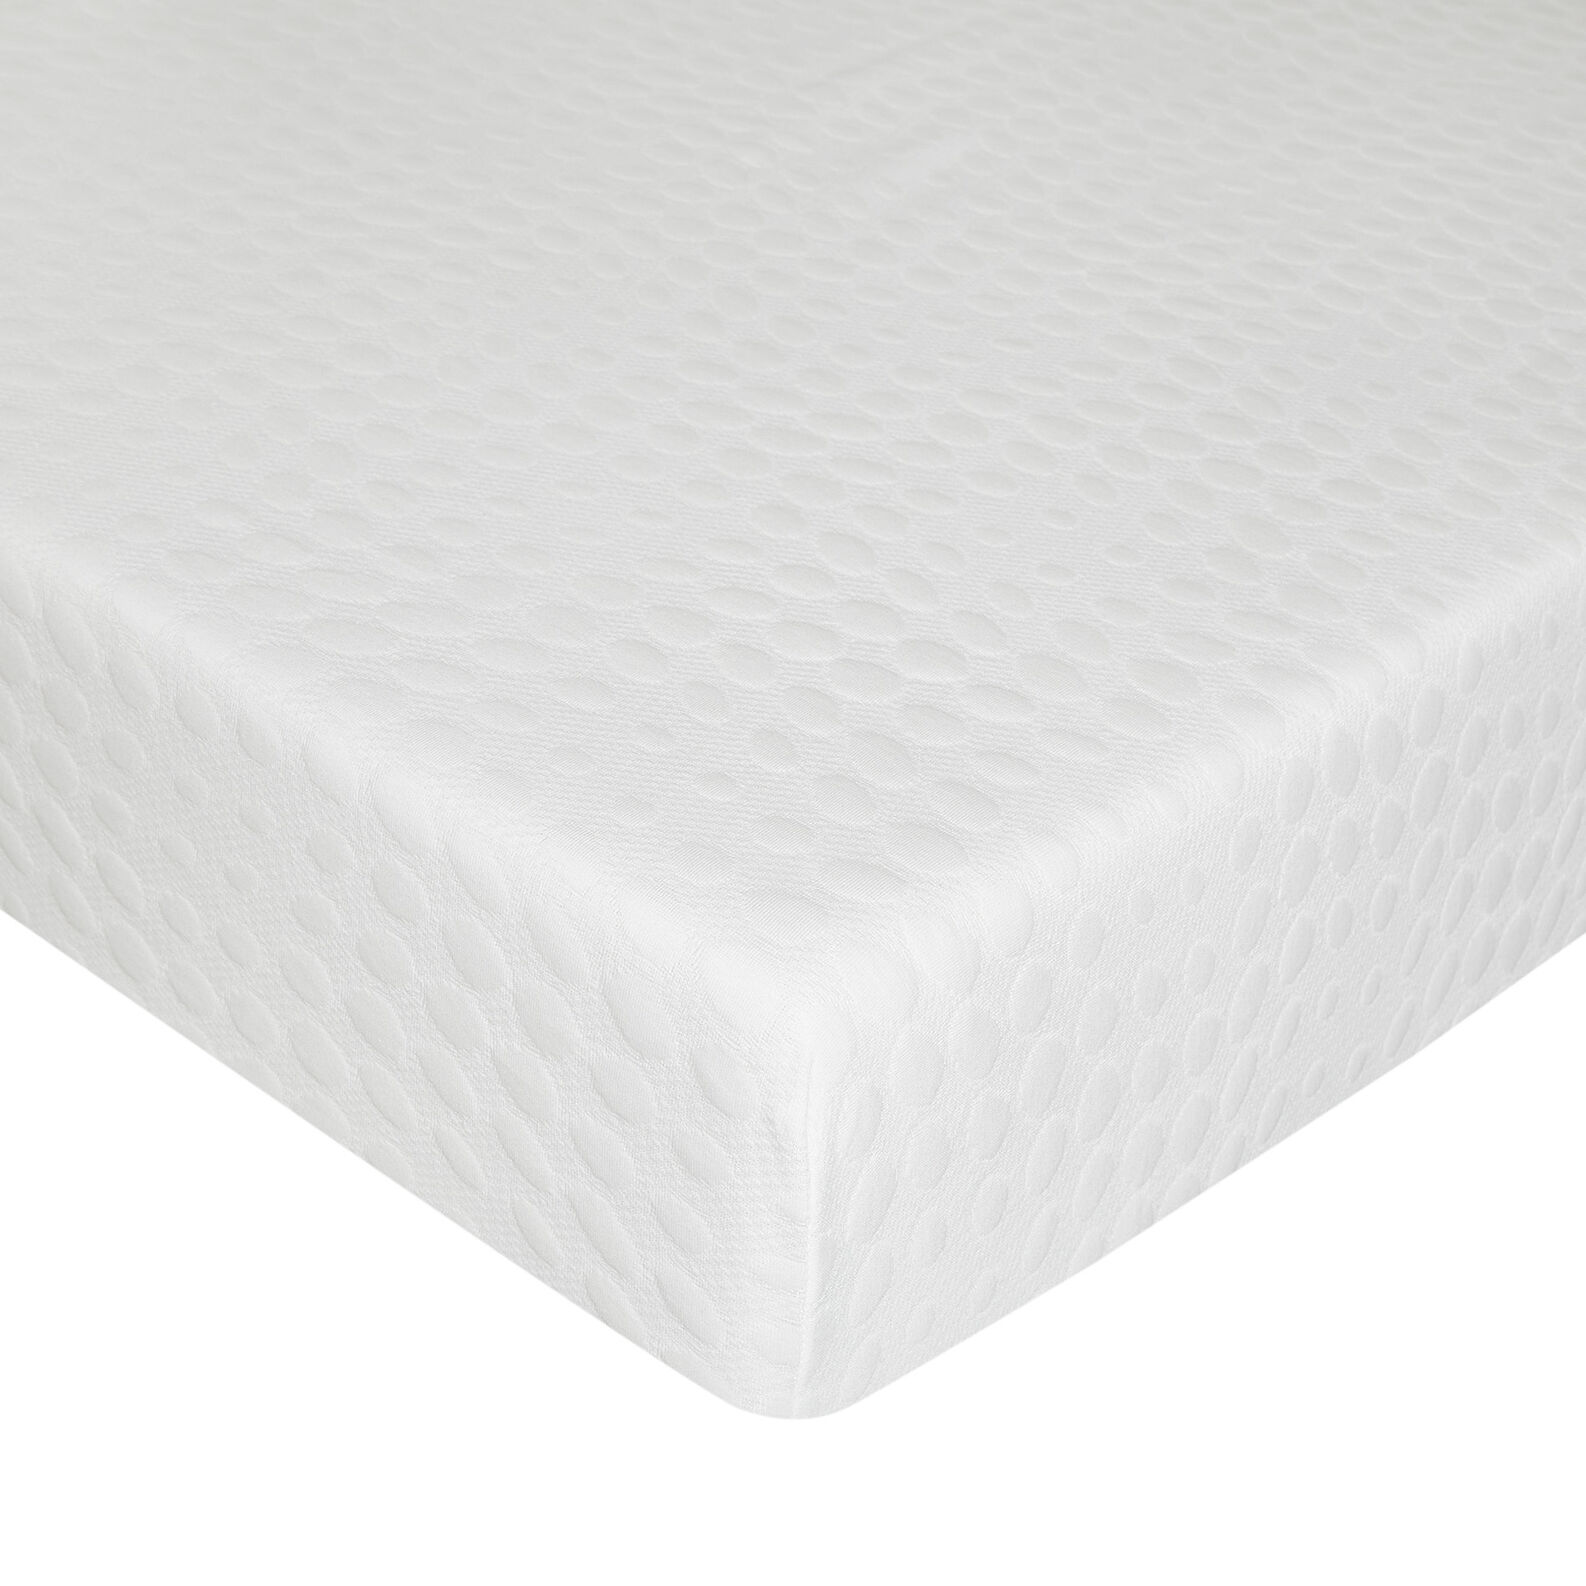 Threelevel® jacquard mattress cover